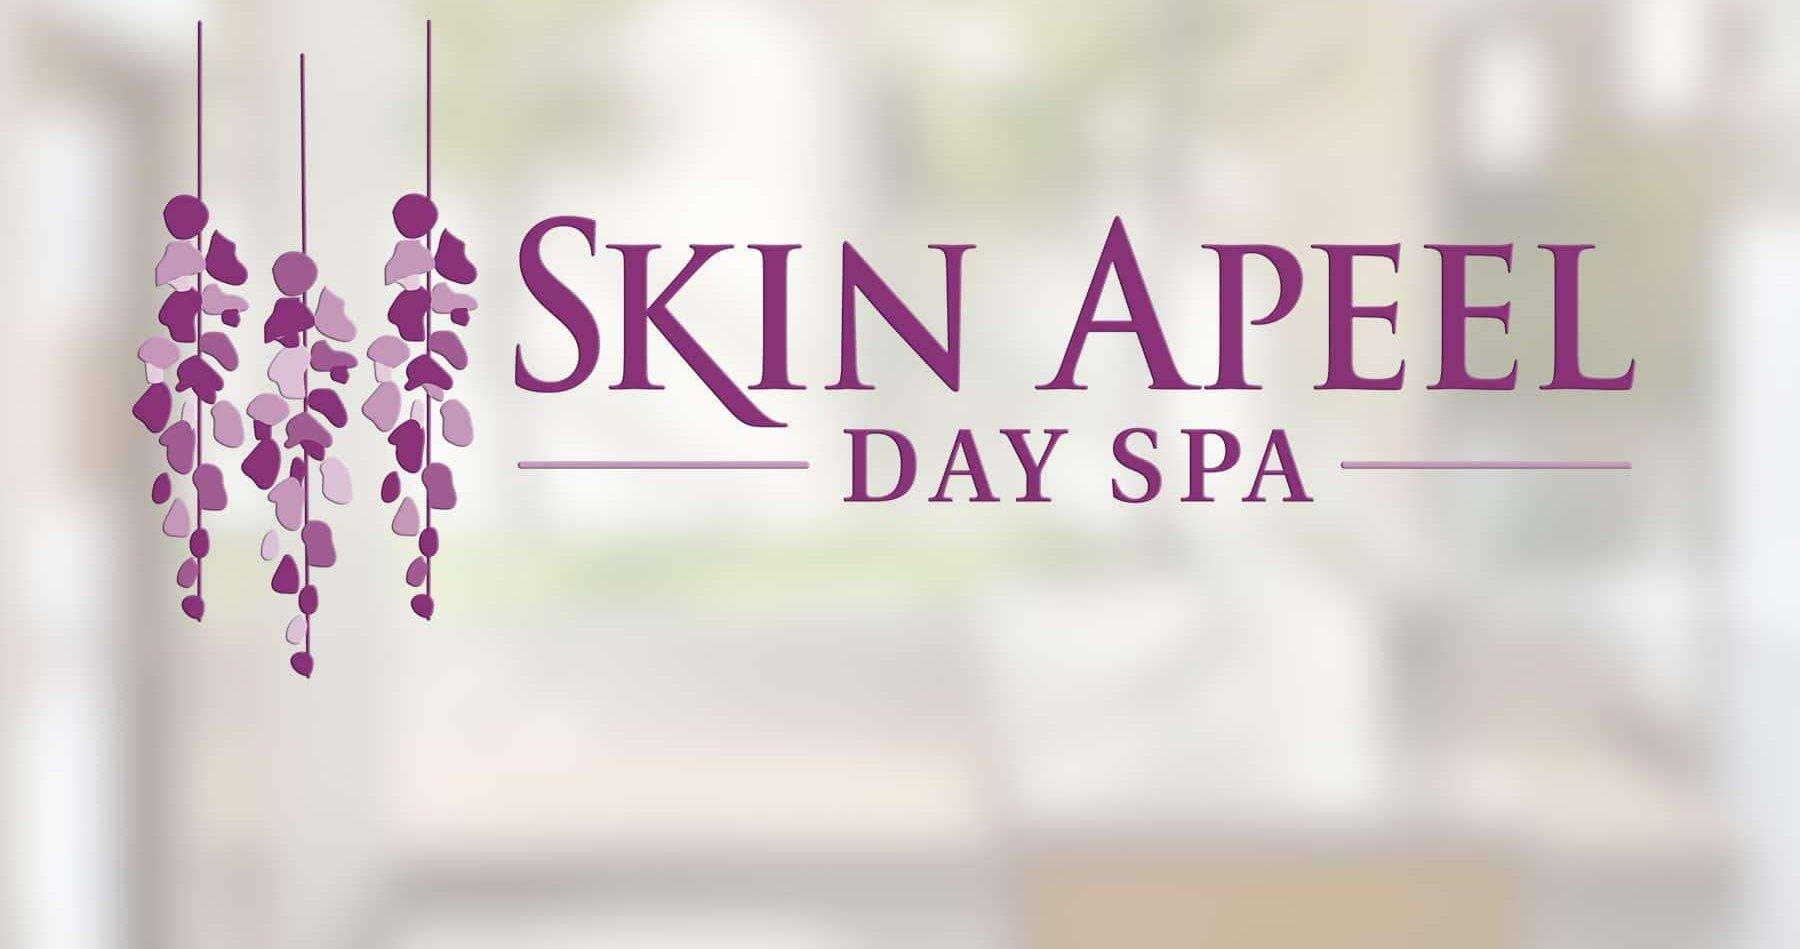 Skin Apeel Day Spa Celebrates 26 Years!